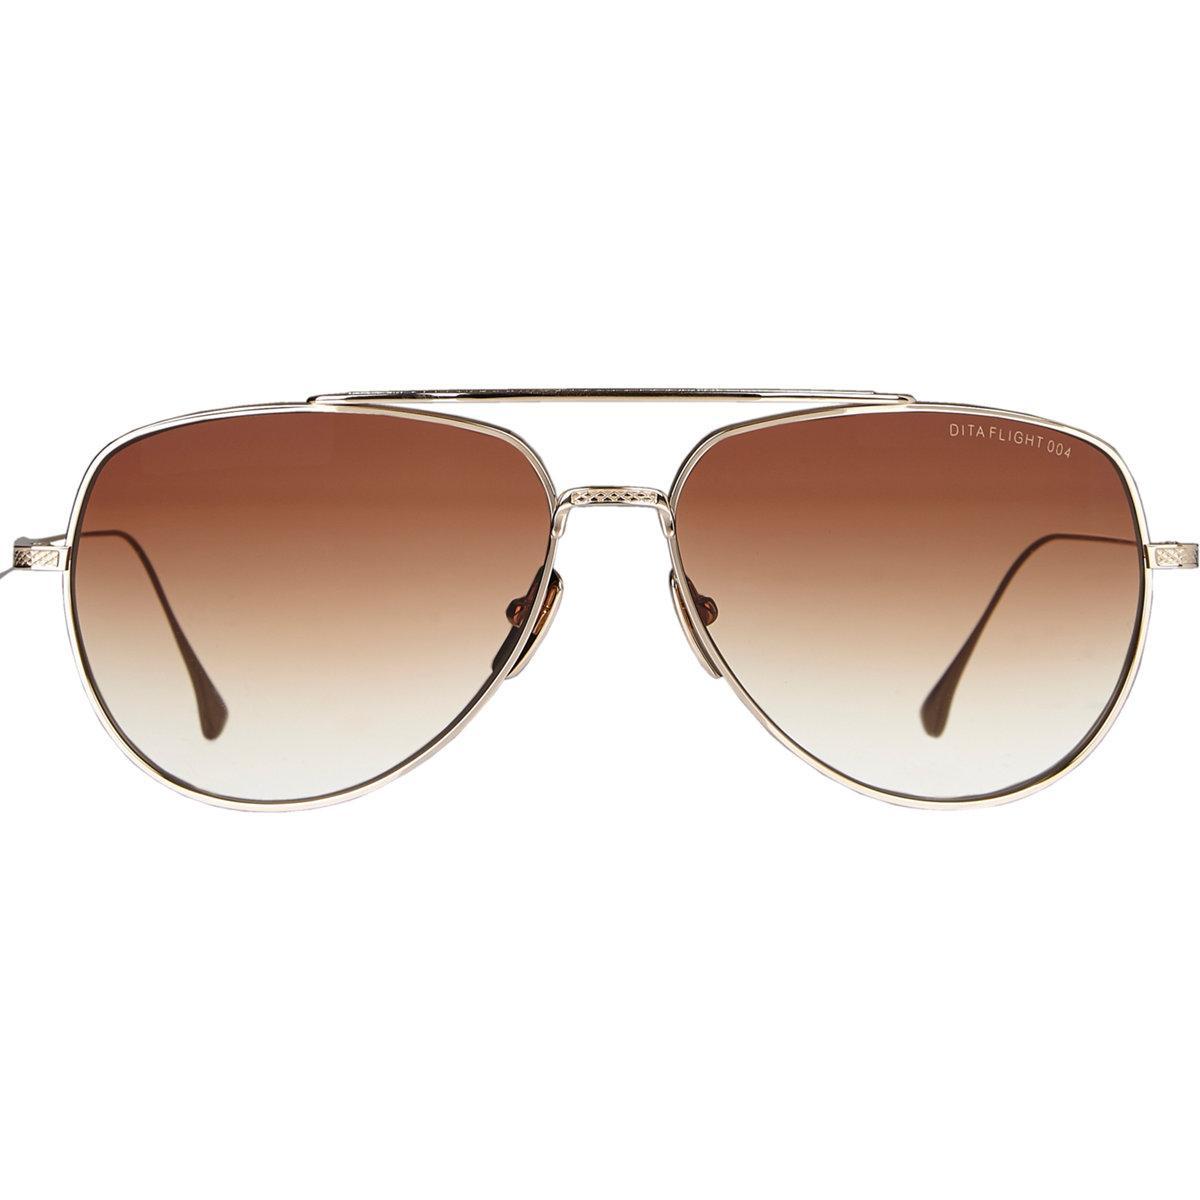 91613b828b0b Lyst - DITA Flight.004 Sunglasses in Metallic for Men